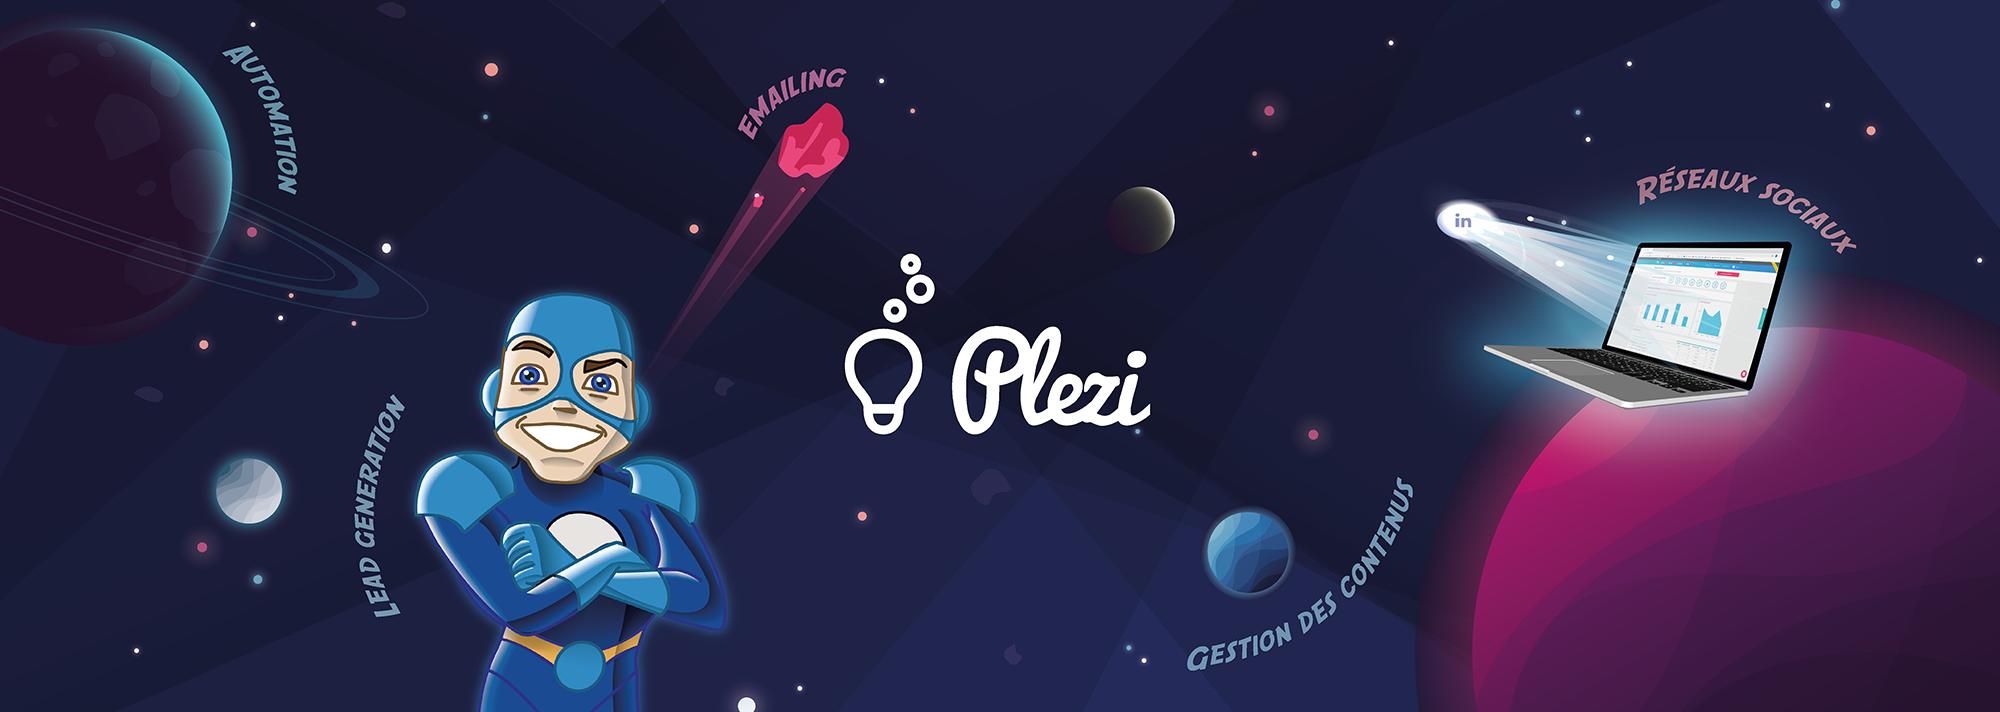 header Plezi